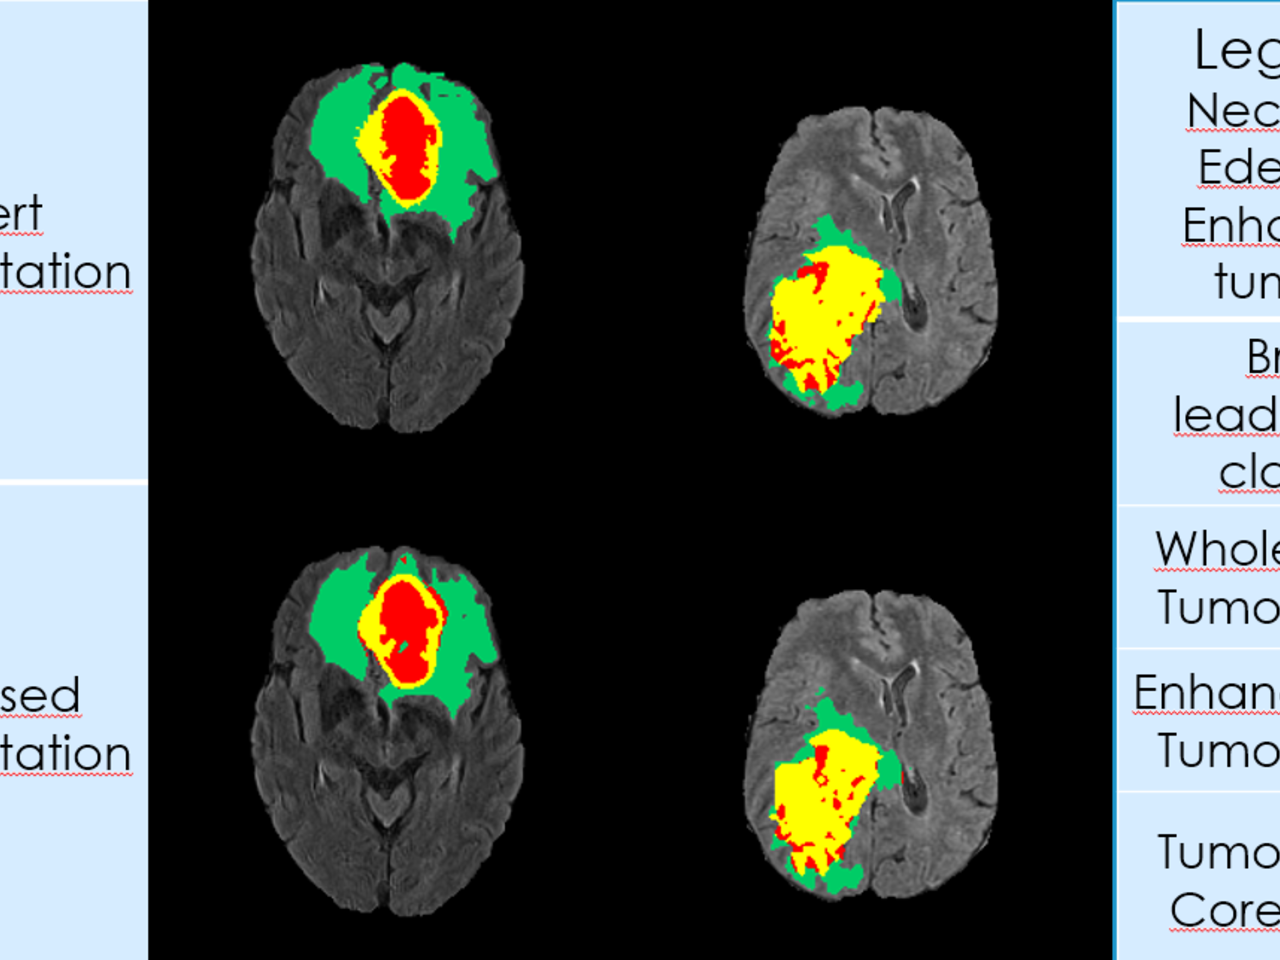 BRATS 2017 Glioma segmentation using Fully Convolutional Neural Networks